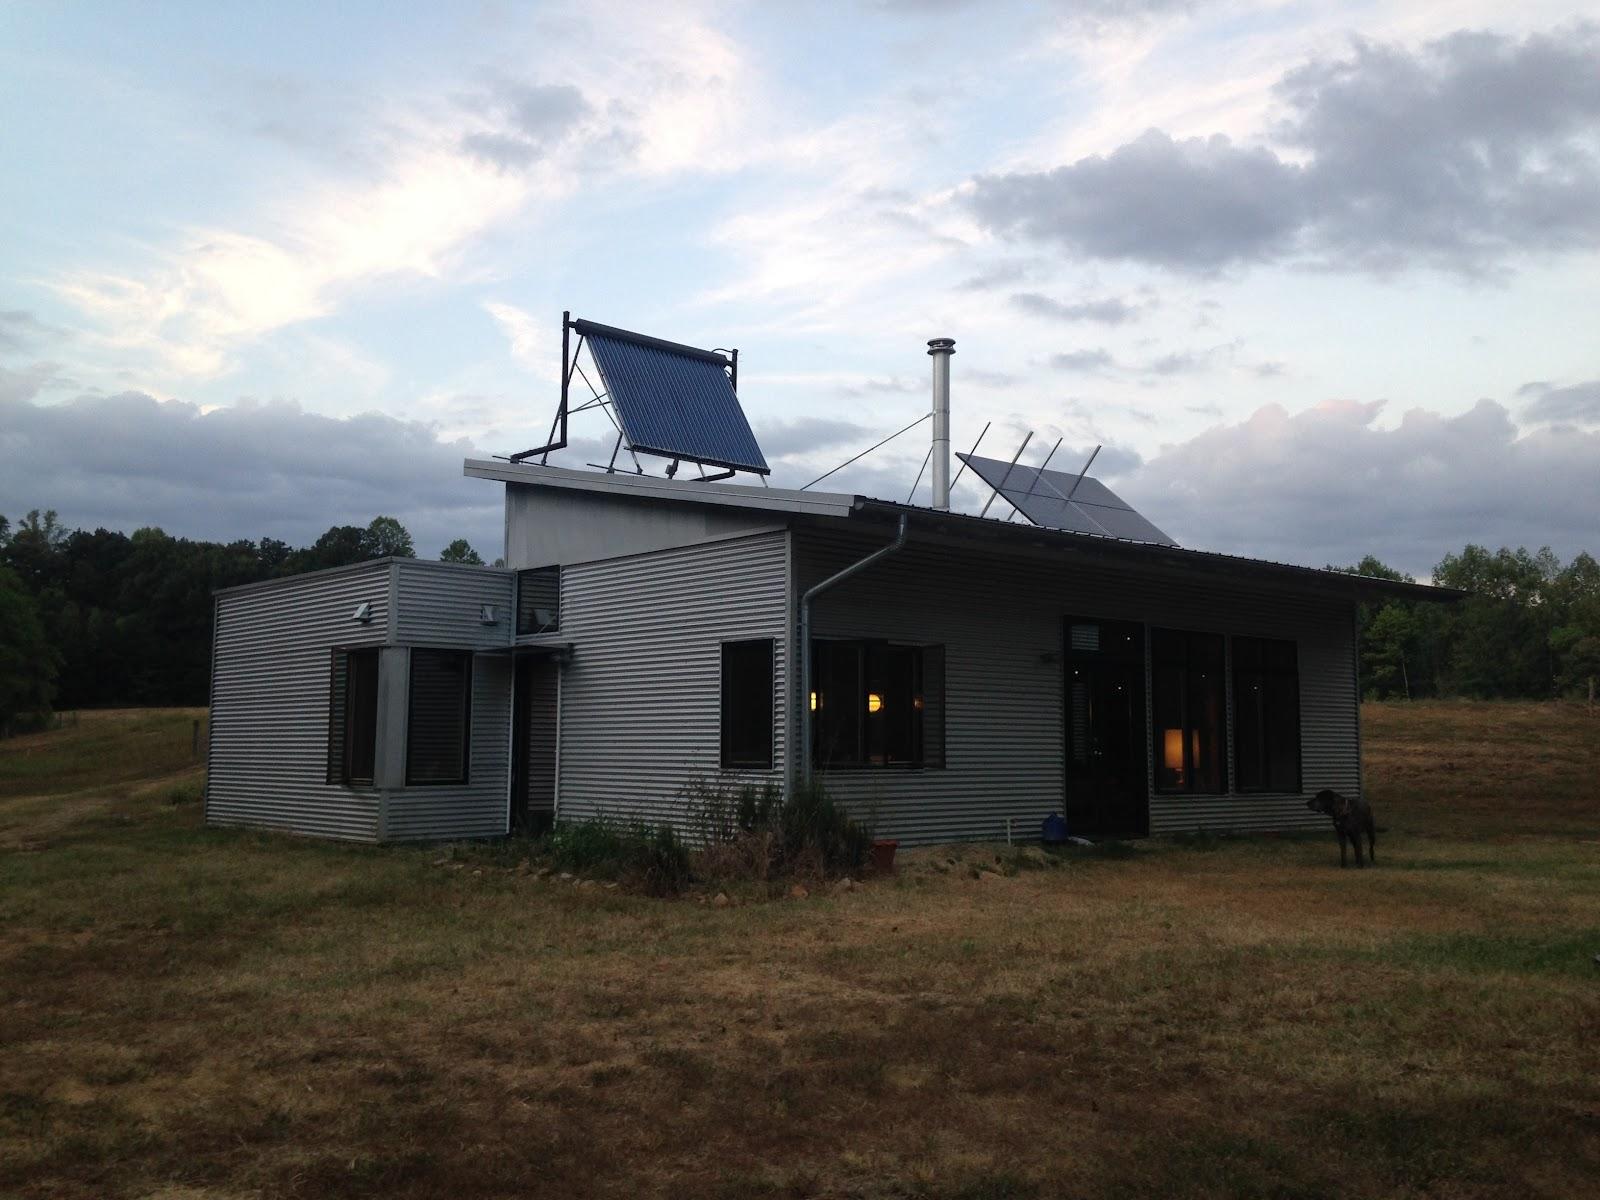 Passive solar net zero prefab house prepares for another for Passive solar prefab homes